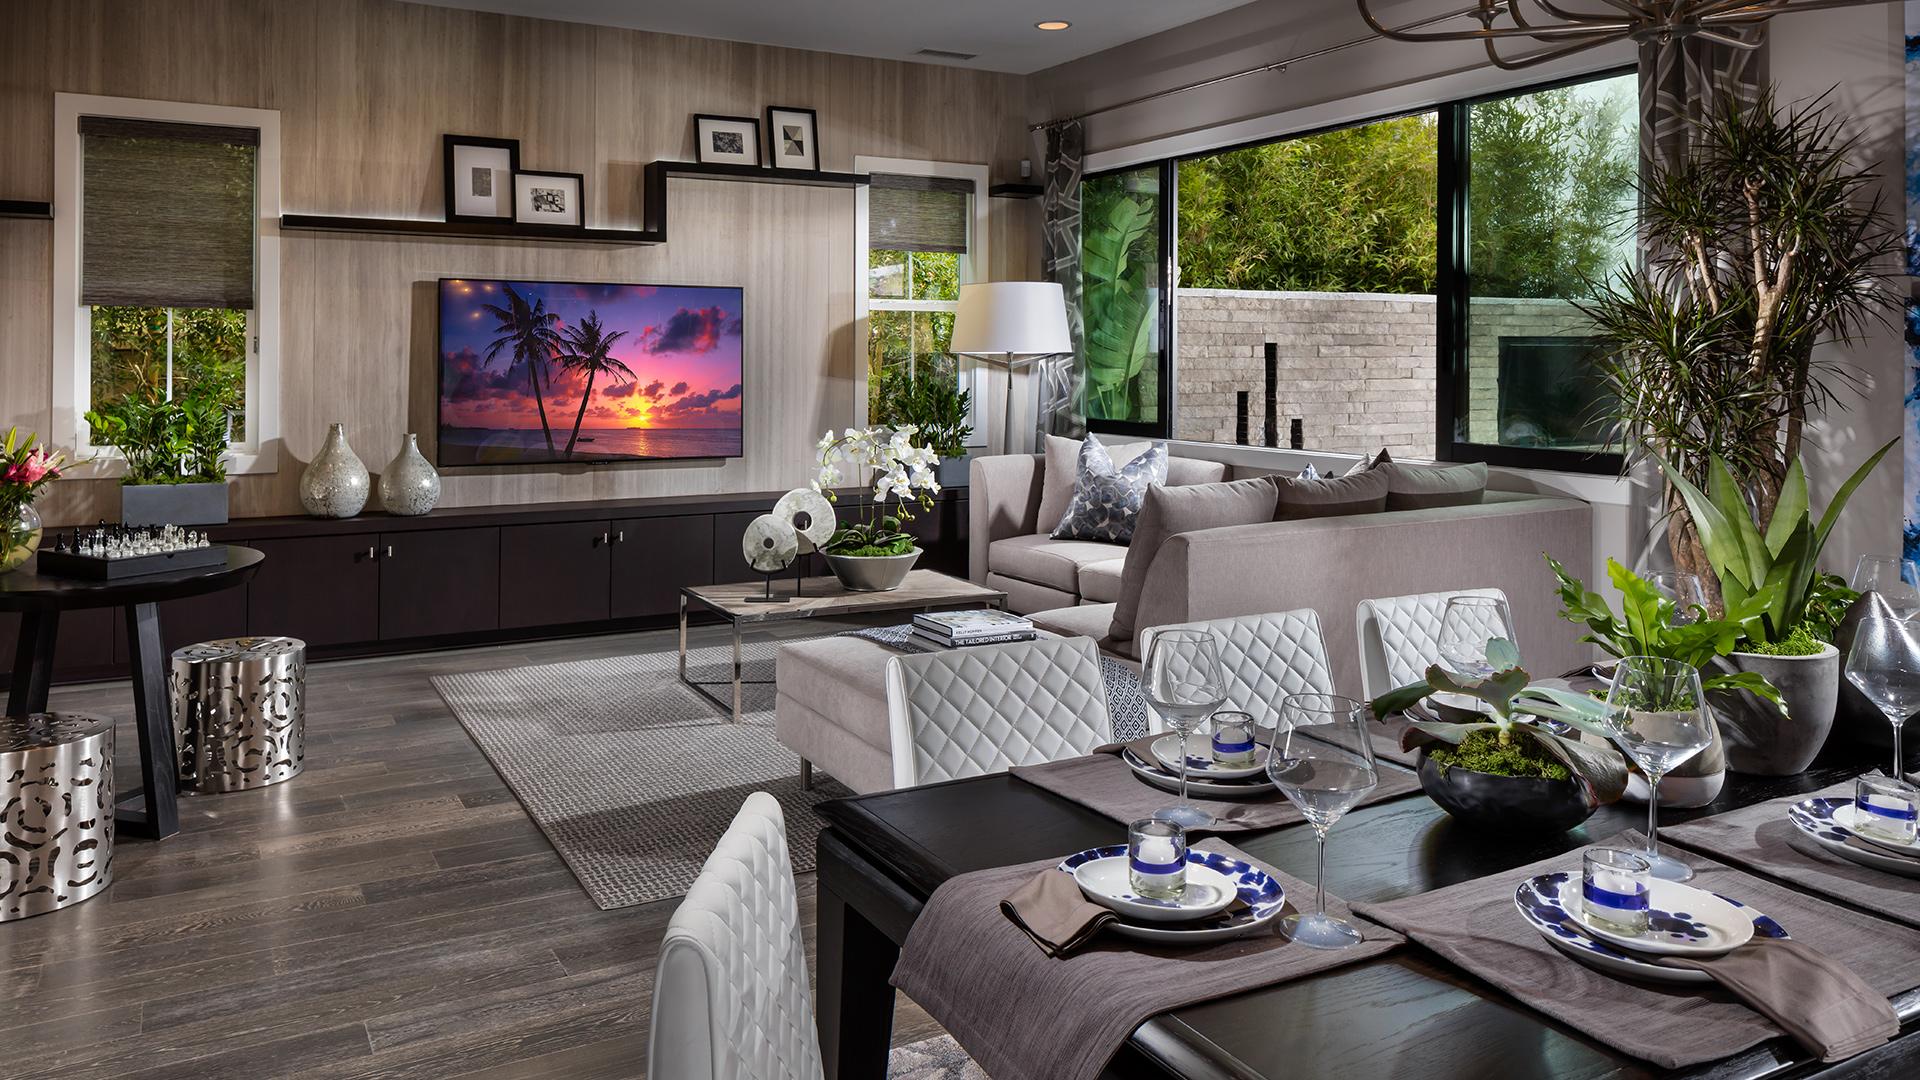 The Spacious Mendocino Family Room